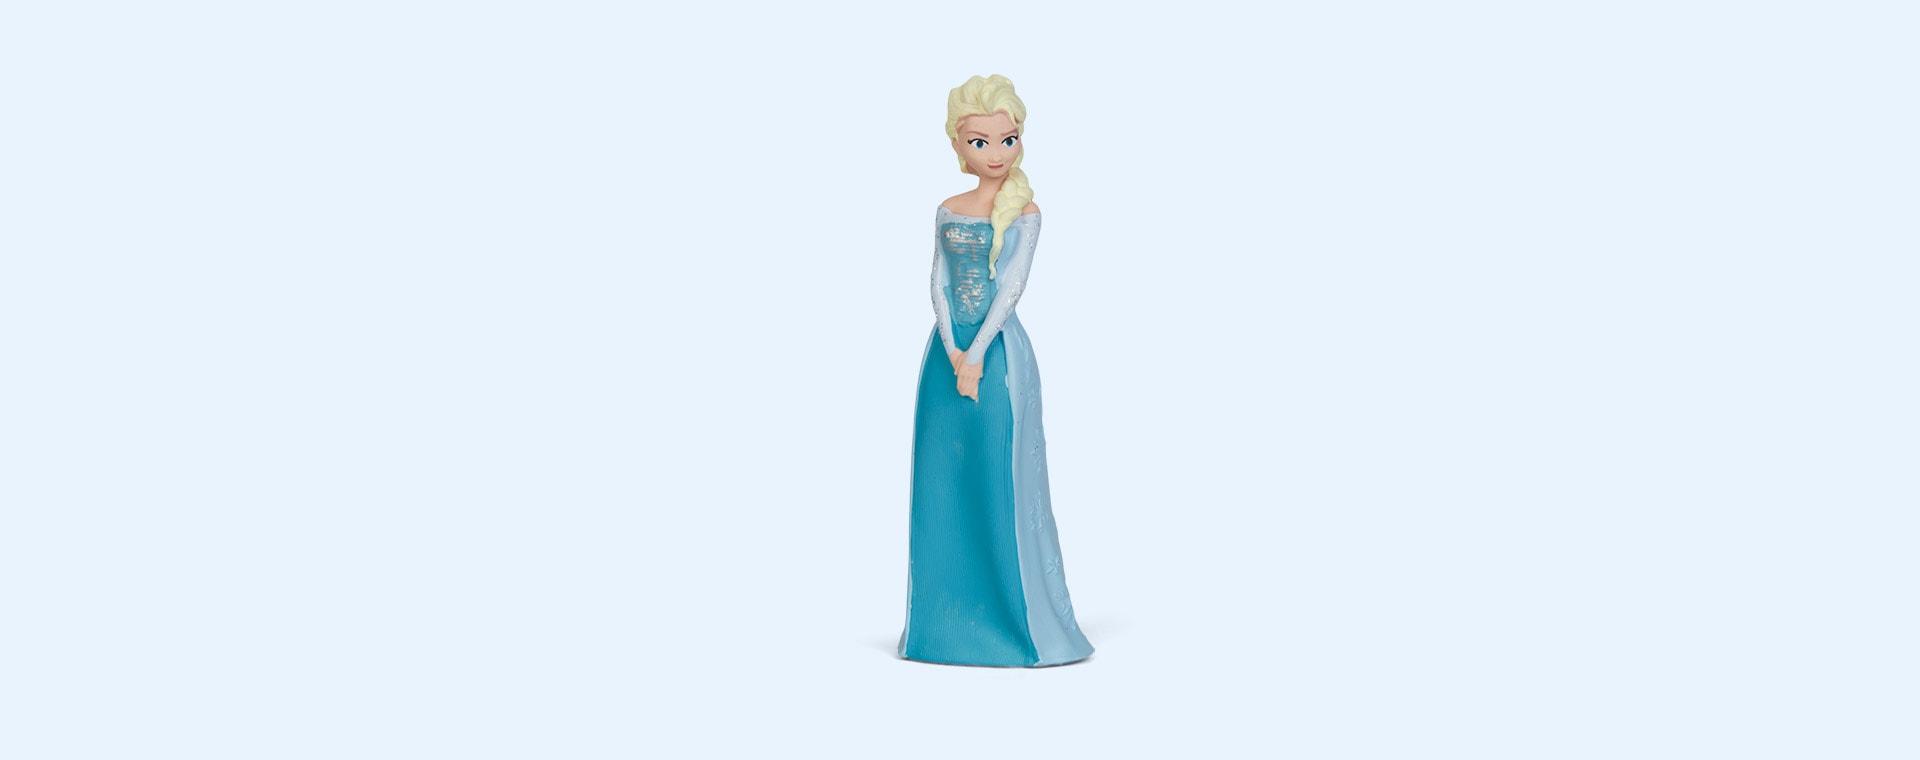 Frozen Story Tonies Frozen Story